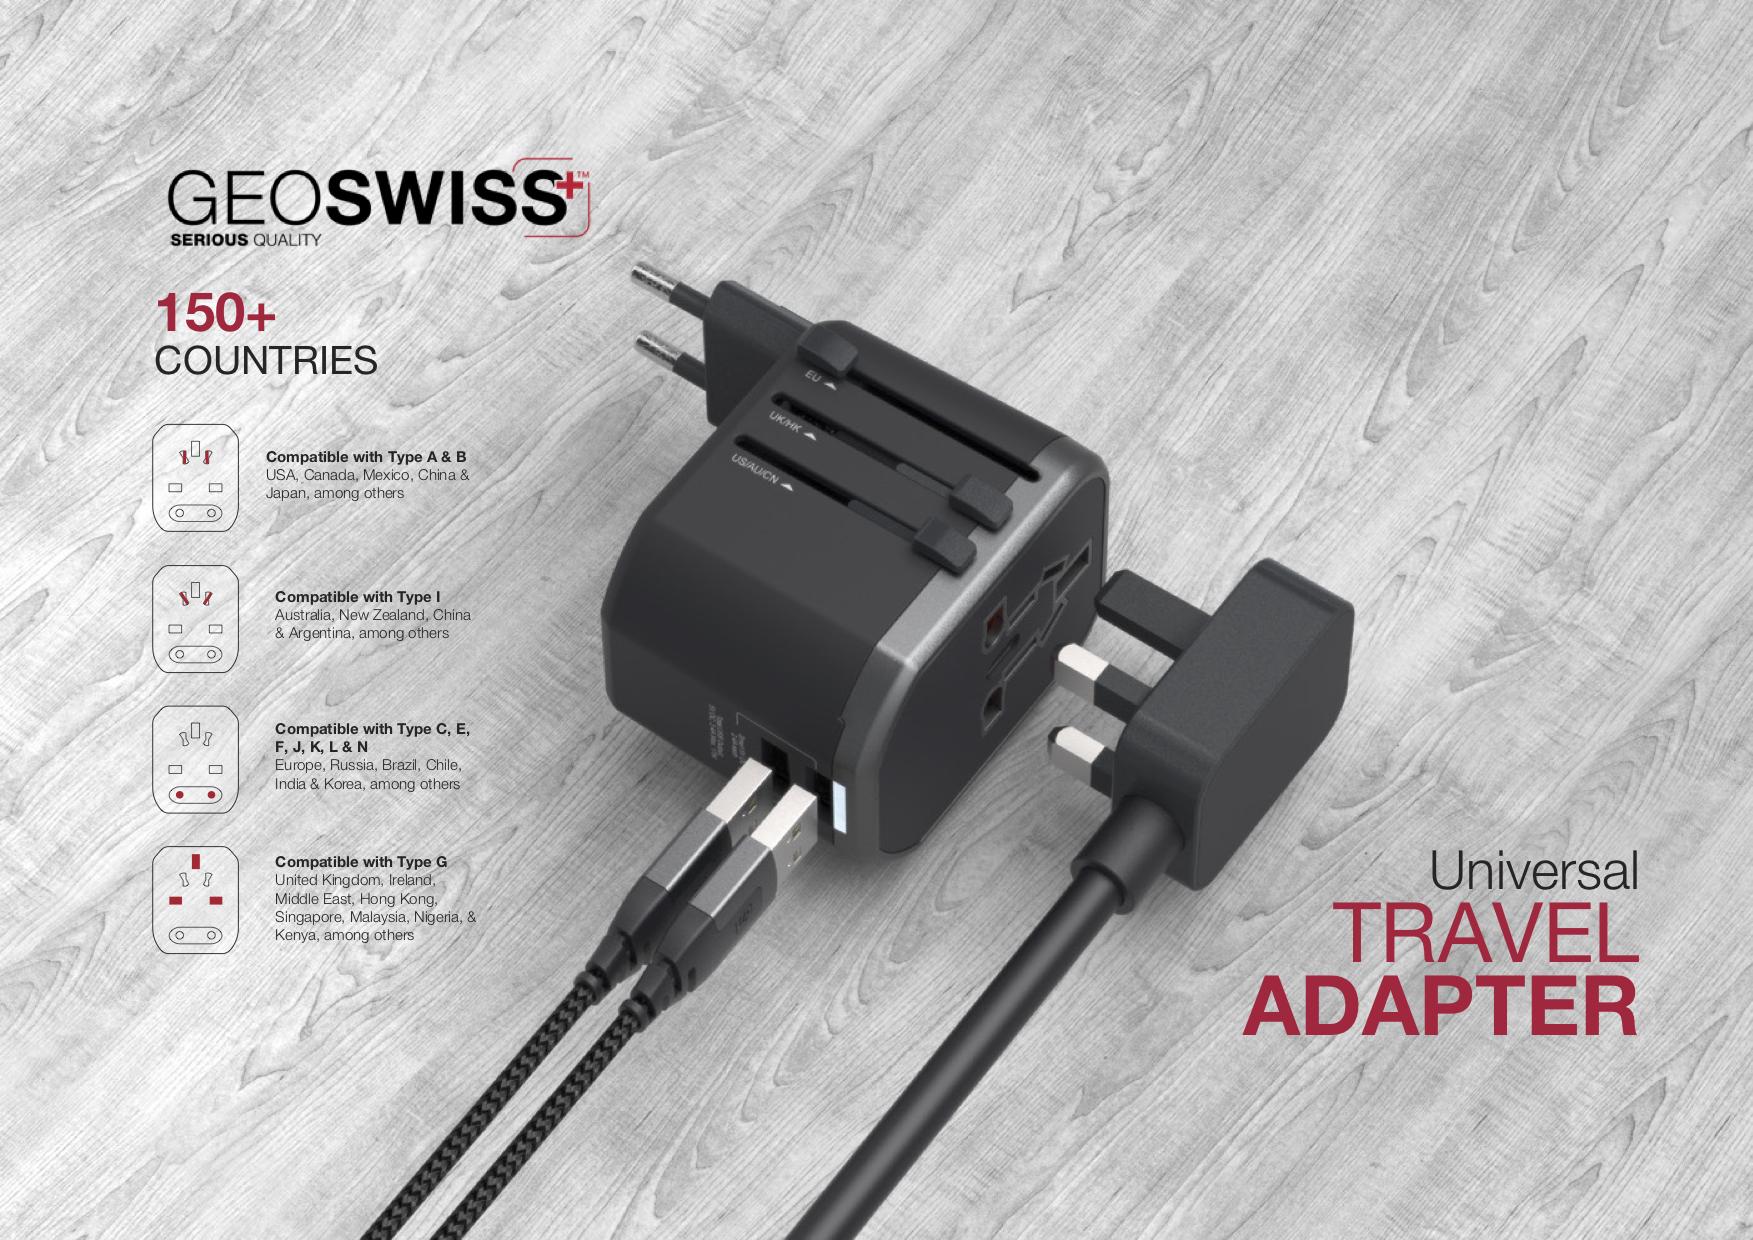 GeoSWISS Universal Travel Adapter for website.jpg